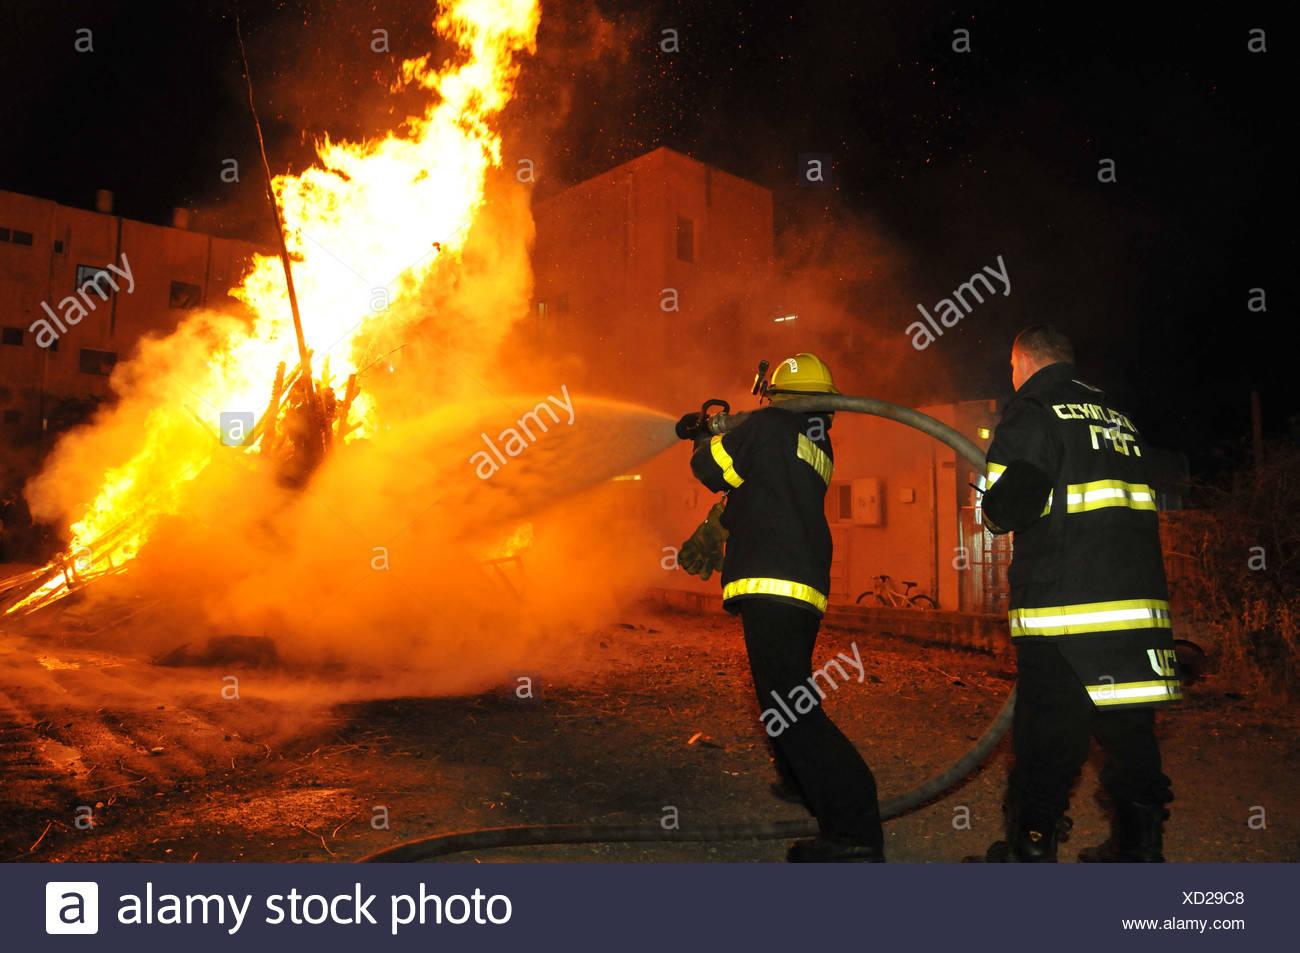 Israel, Haifa, Firefighter extinguish a large bonfire during the lag b'omer celebrations - Stock Image